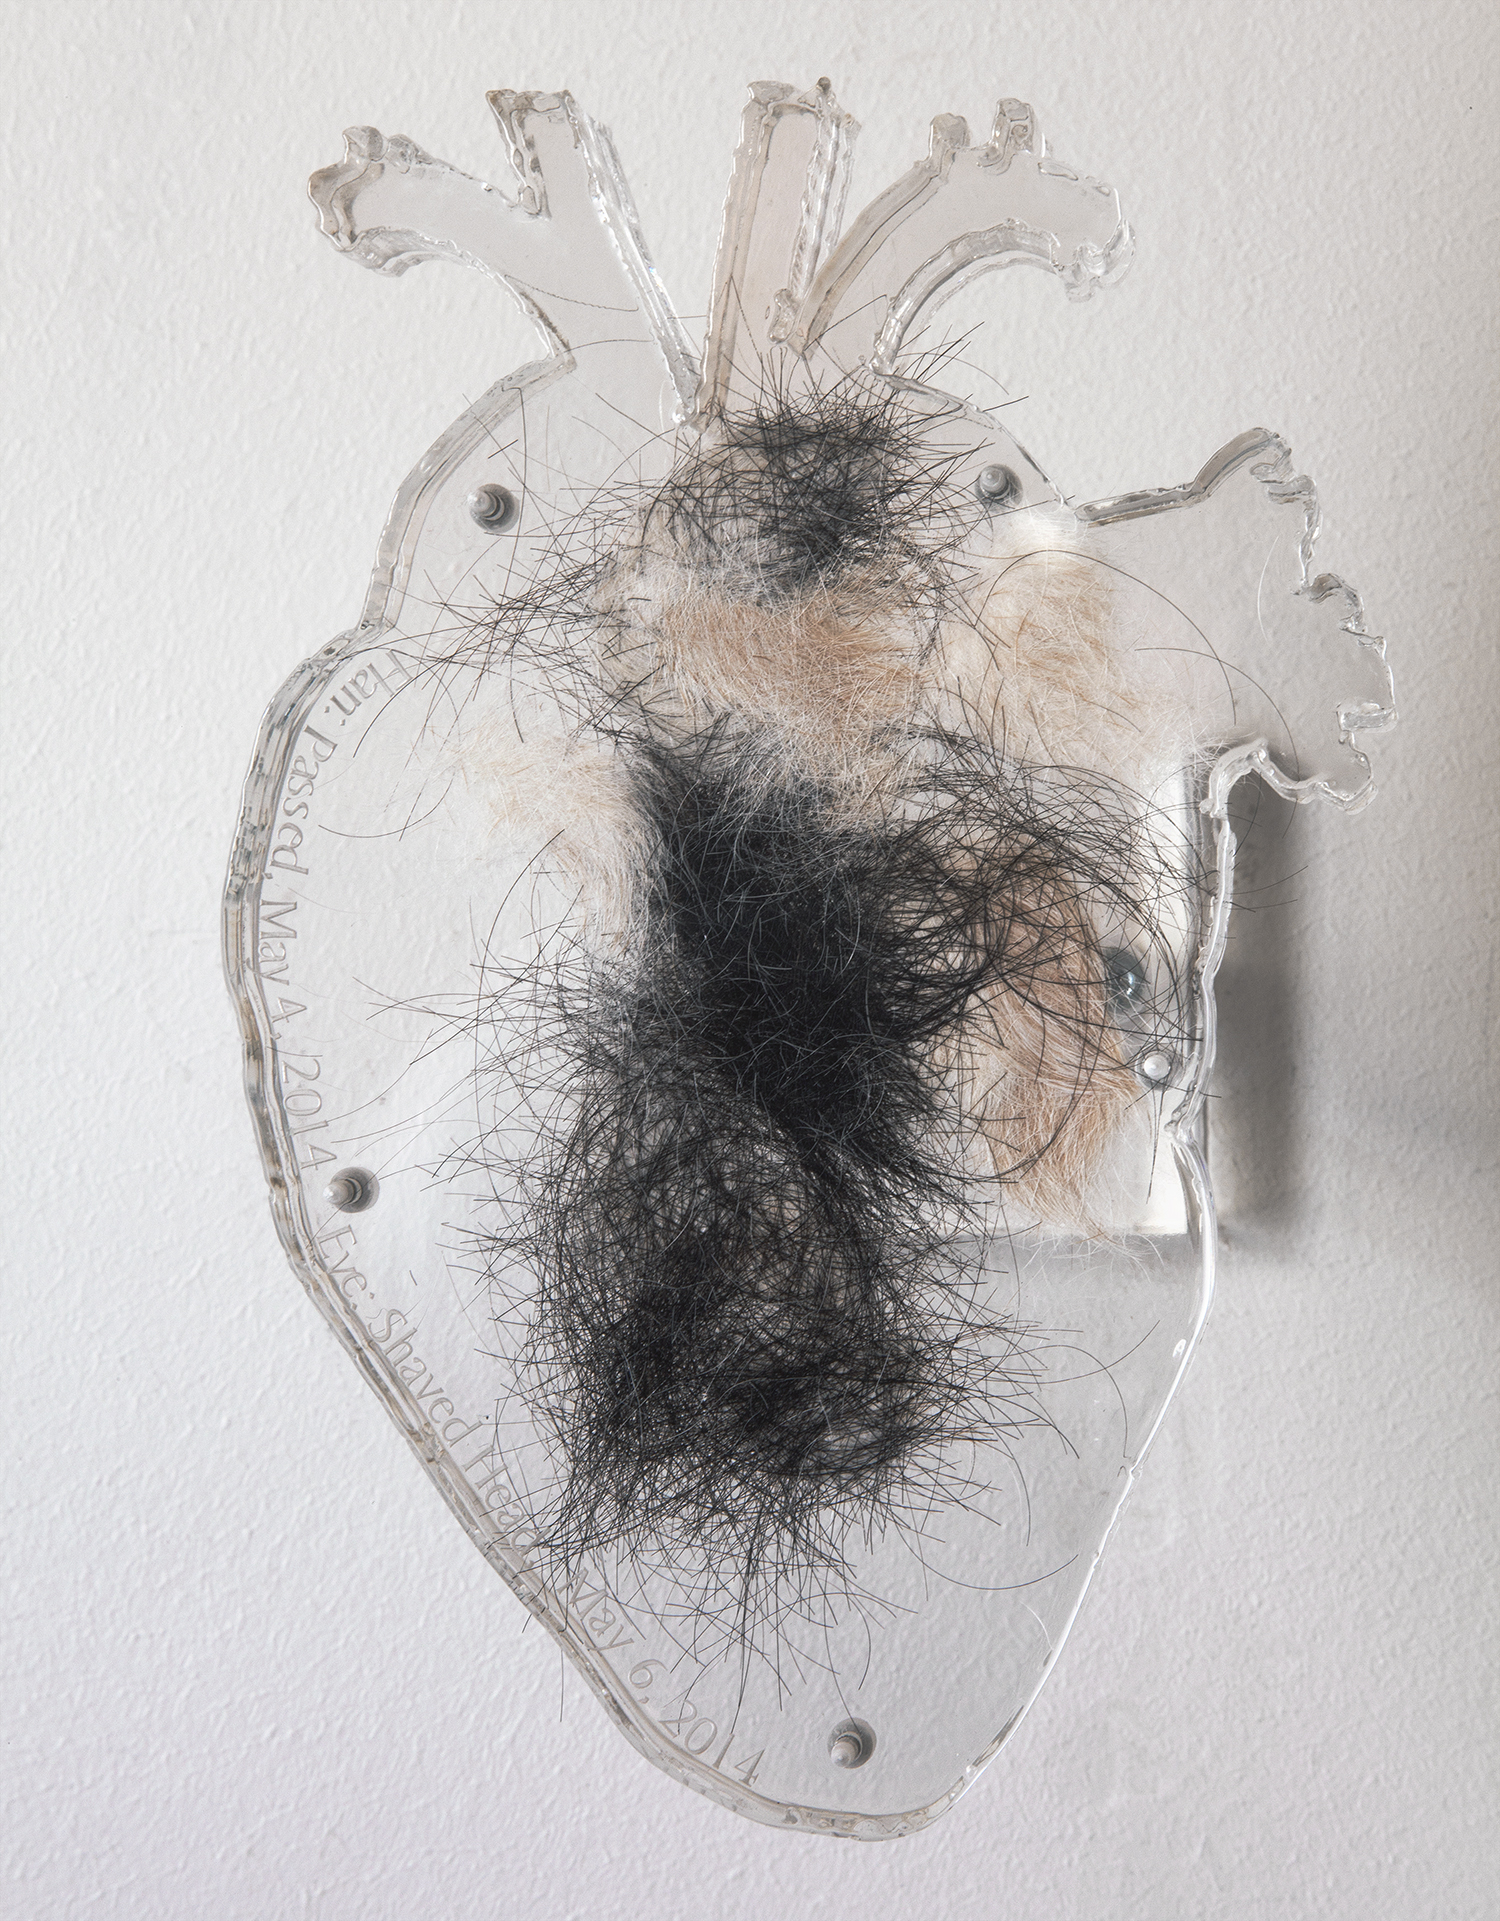 Eve Wood  Final Translation  2014 Acrylic, dog hair, human hair 8 x 6 x 9 Inches   Courtesy of the Artist